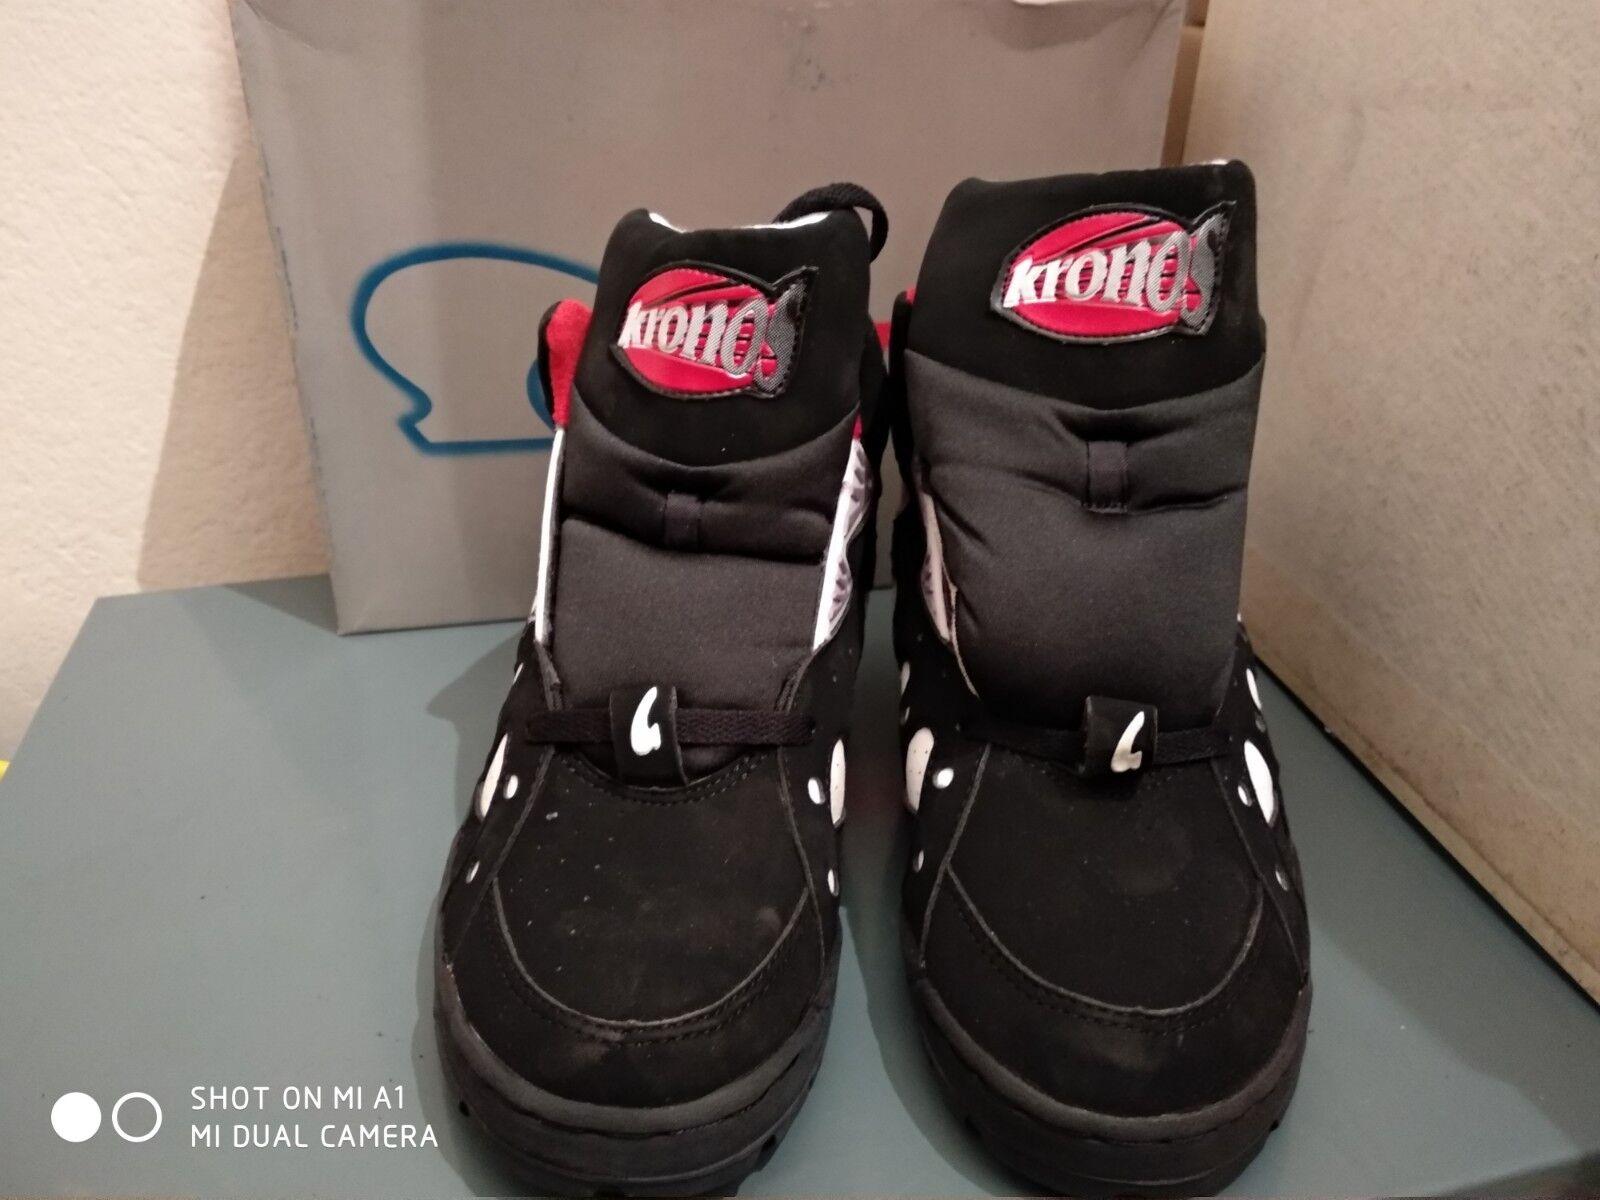 Vintage Kronos Basketball Chaussures bon état taille 9 US ultra rare